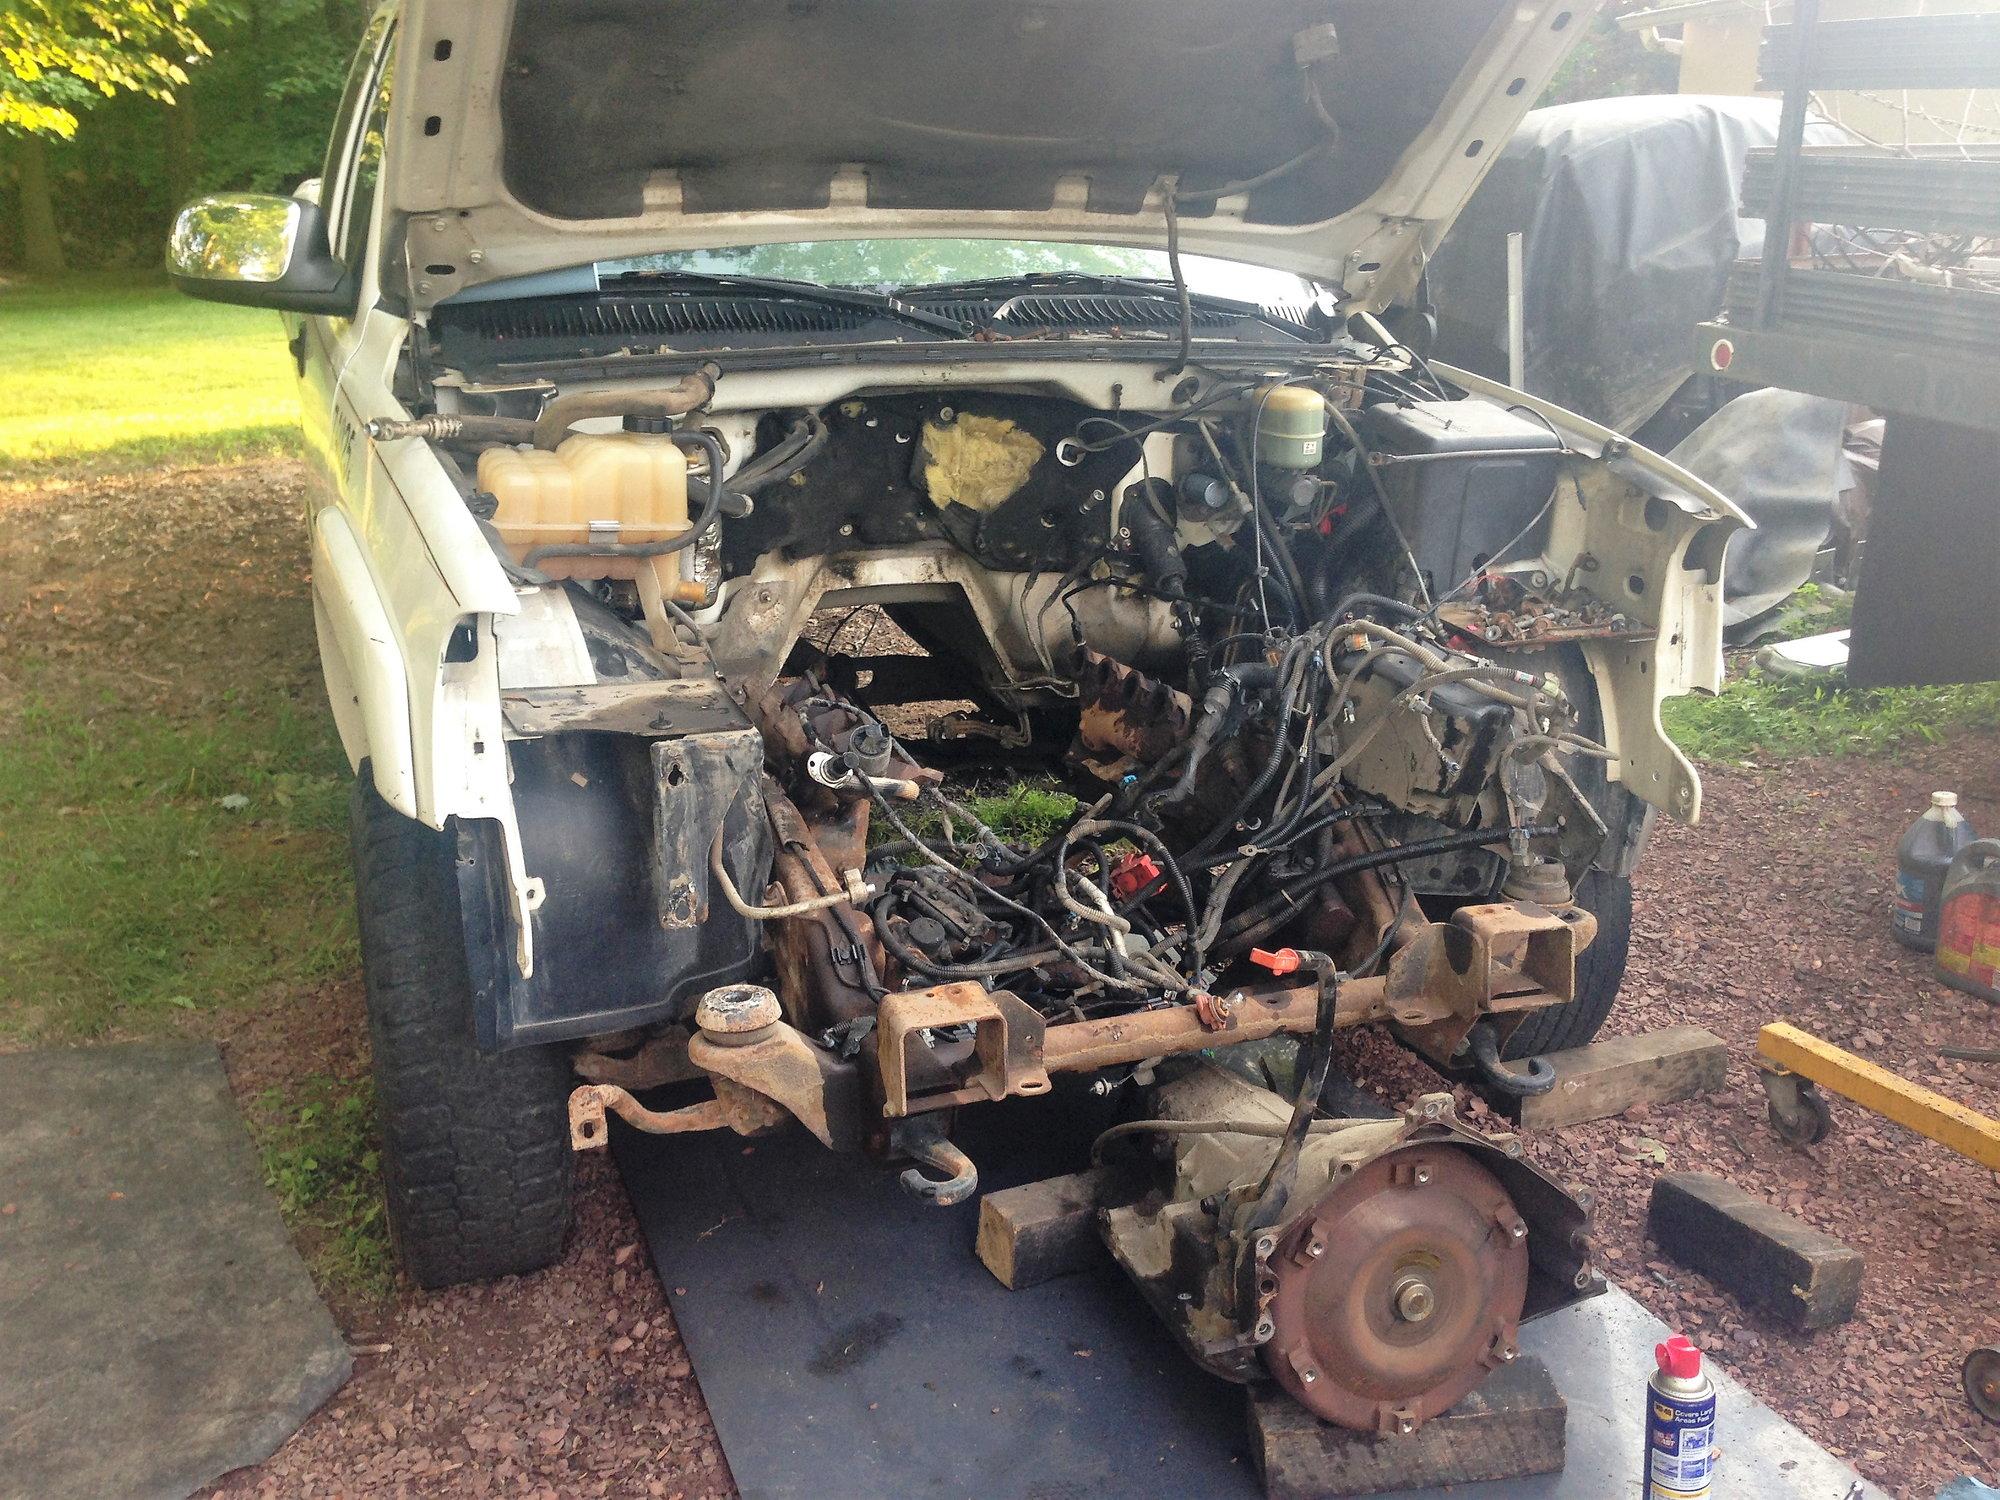 DIY f-body hydroboost on the cheap - LS1TECH - Camaro and